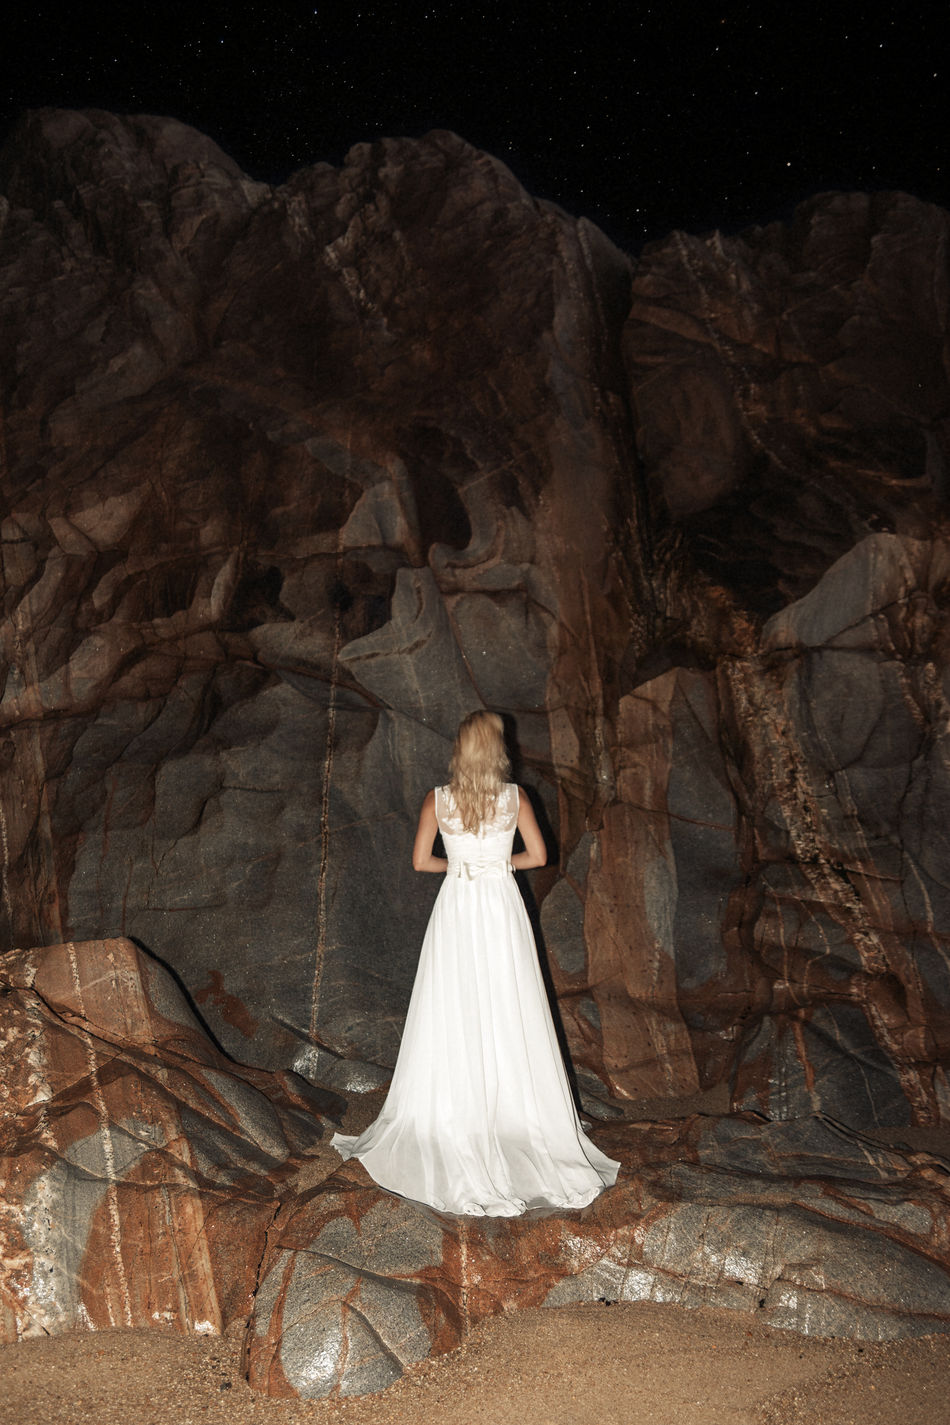 Crystal Castles Beach Blonde Bride Brown Linas Was Here Nightscape Ocean Rocks Rocky Shore Stars Wedding Dress White Woman